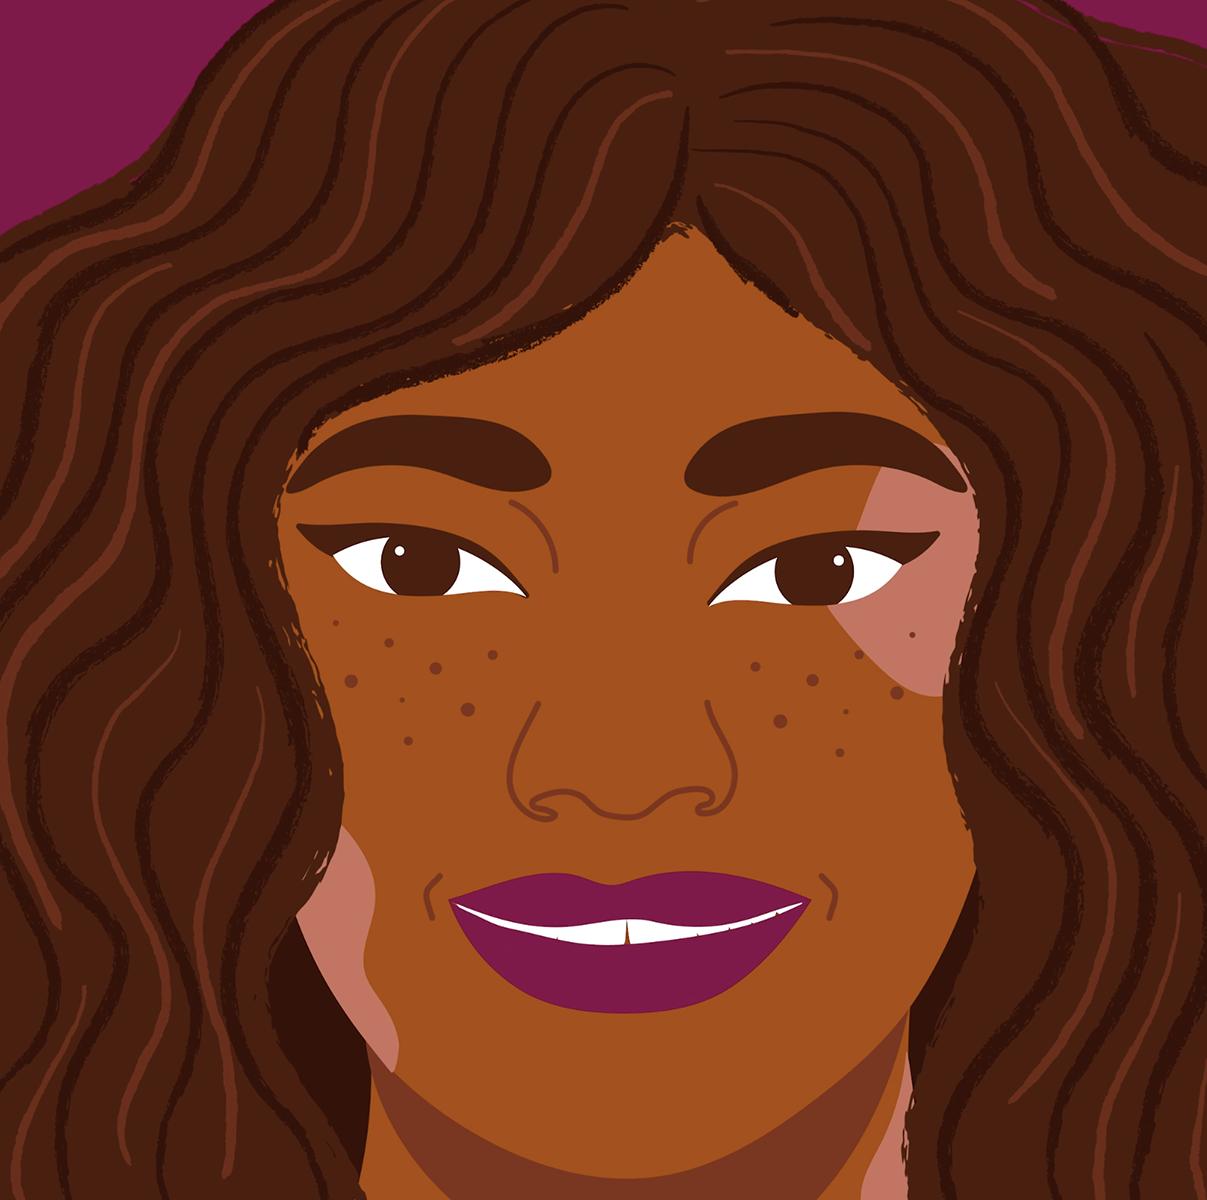 cosmetic, lipstick, make up, portrait, purple, brown, portrait, animation, motion